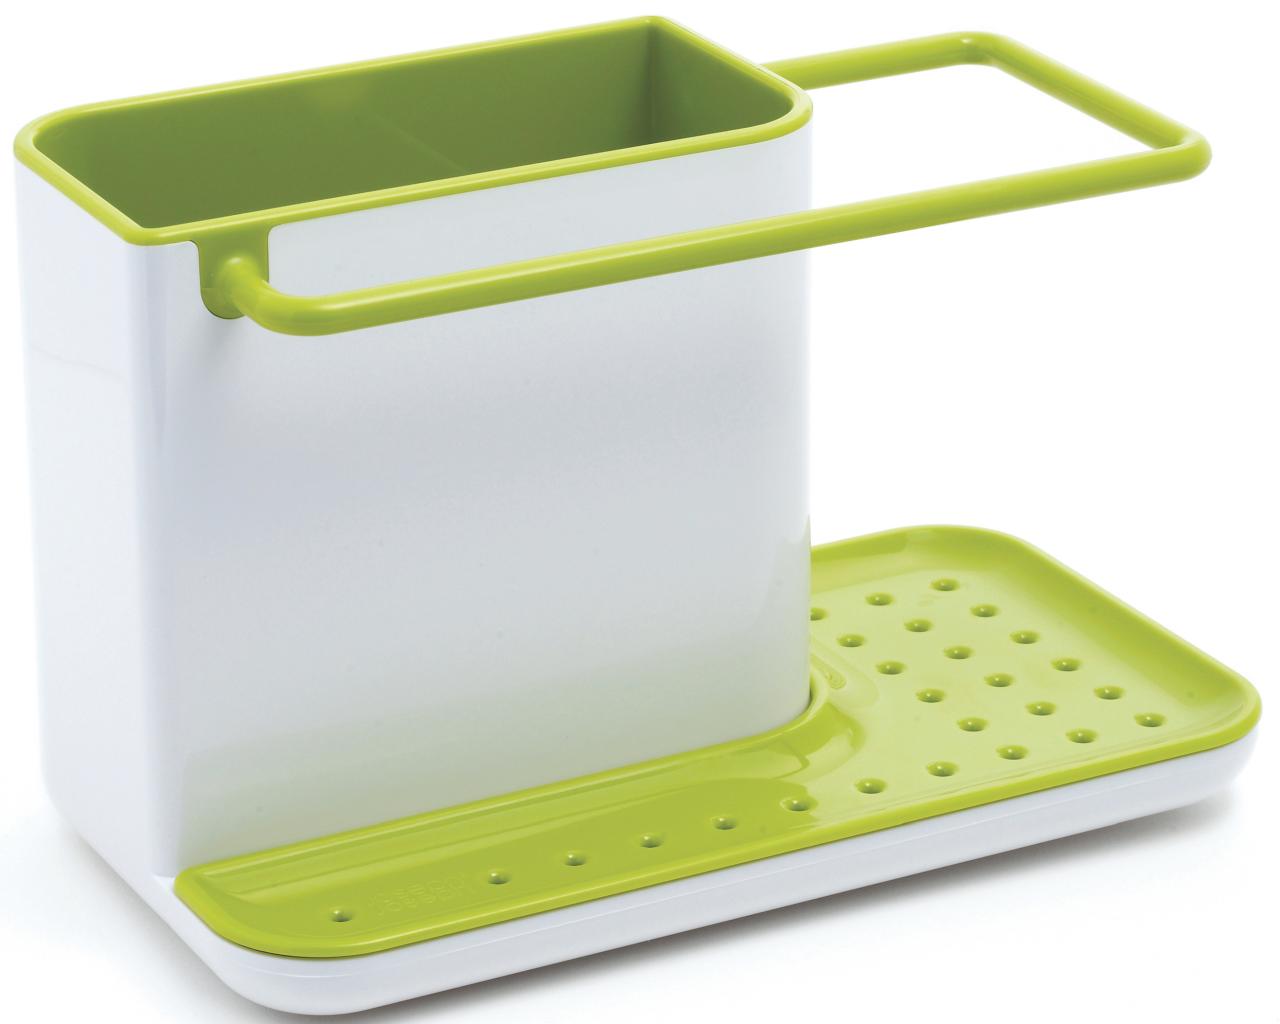 Sink Caddy weiss/grün 21x13cm